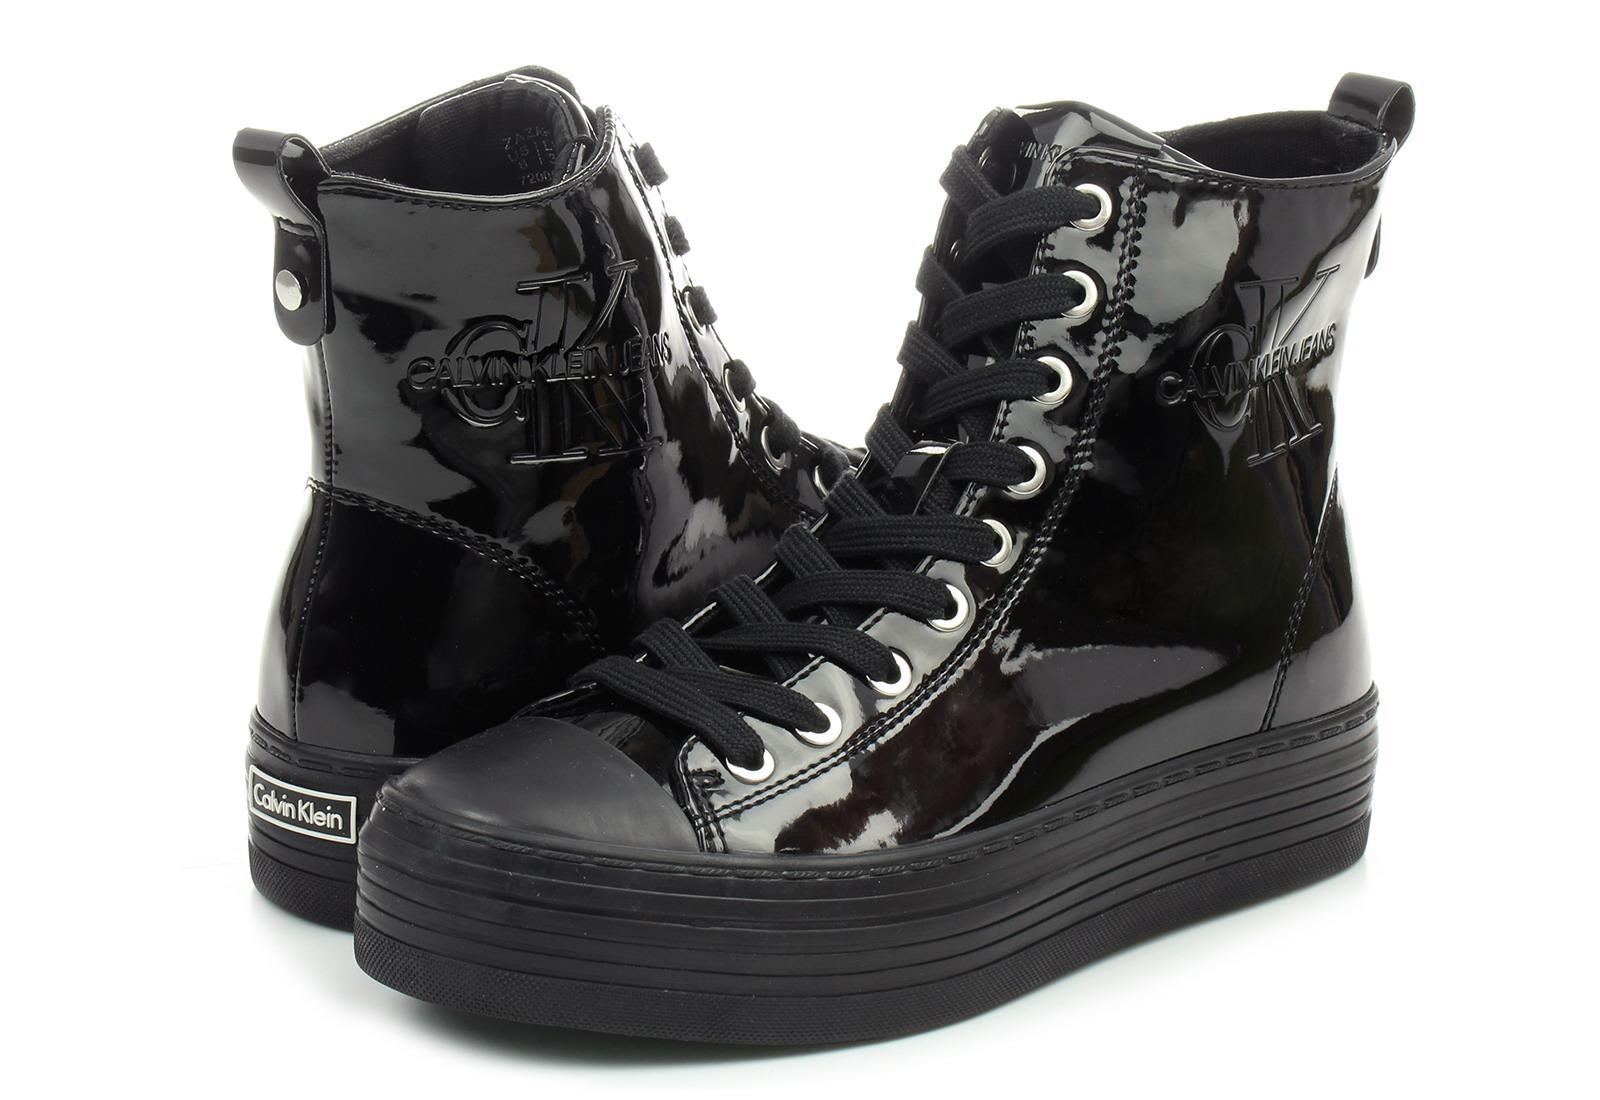 a47e324105 Calvin Klein Jeans Cipő - Zazah - RE9793-BLK - Office Shoes Magyarország